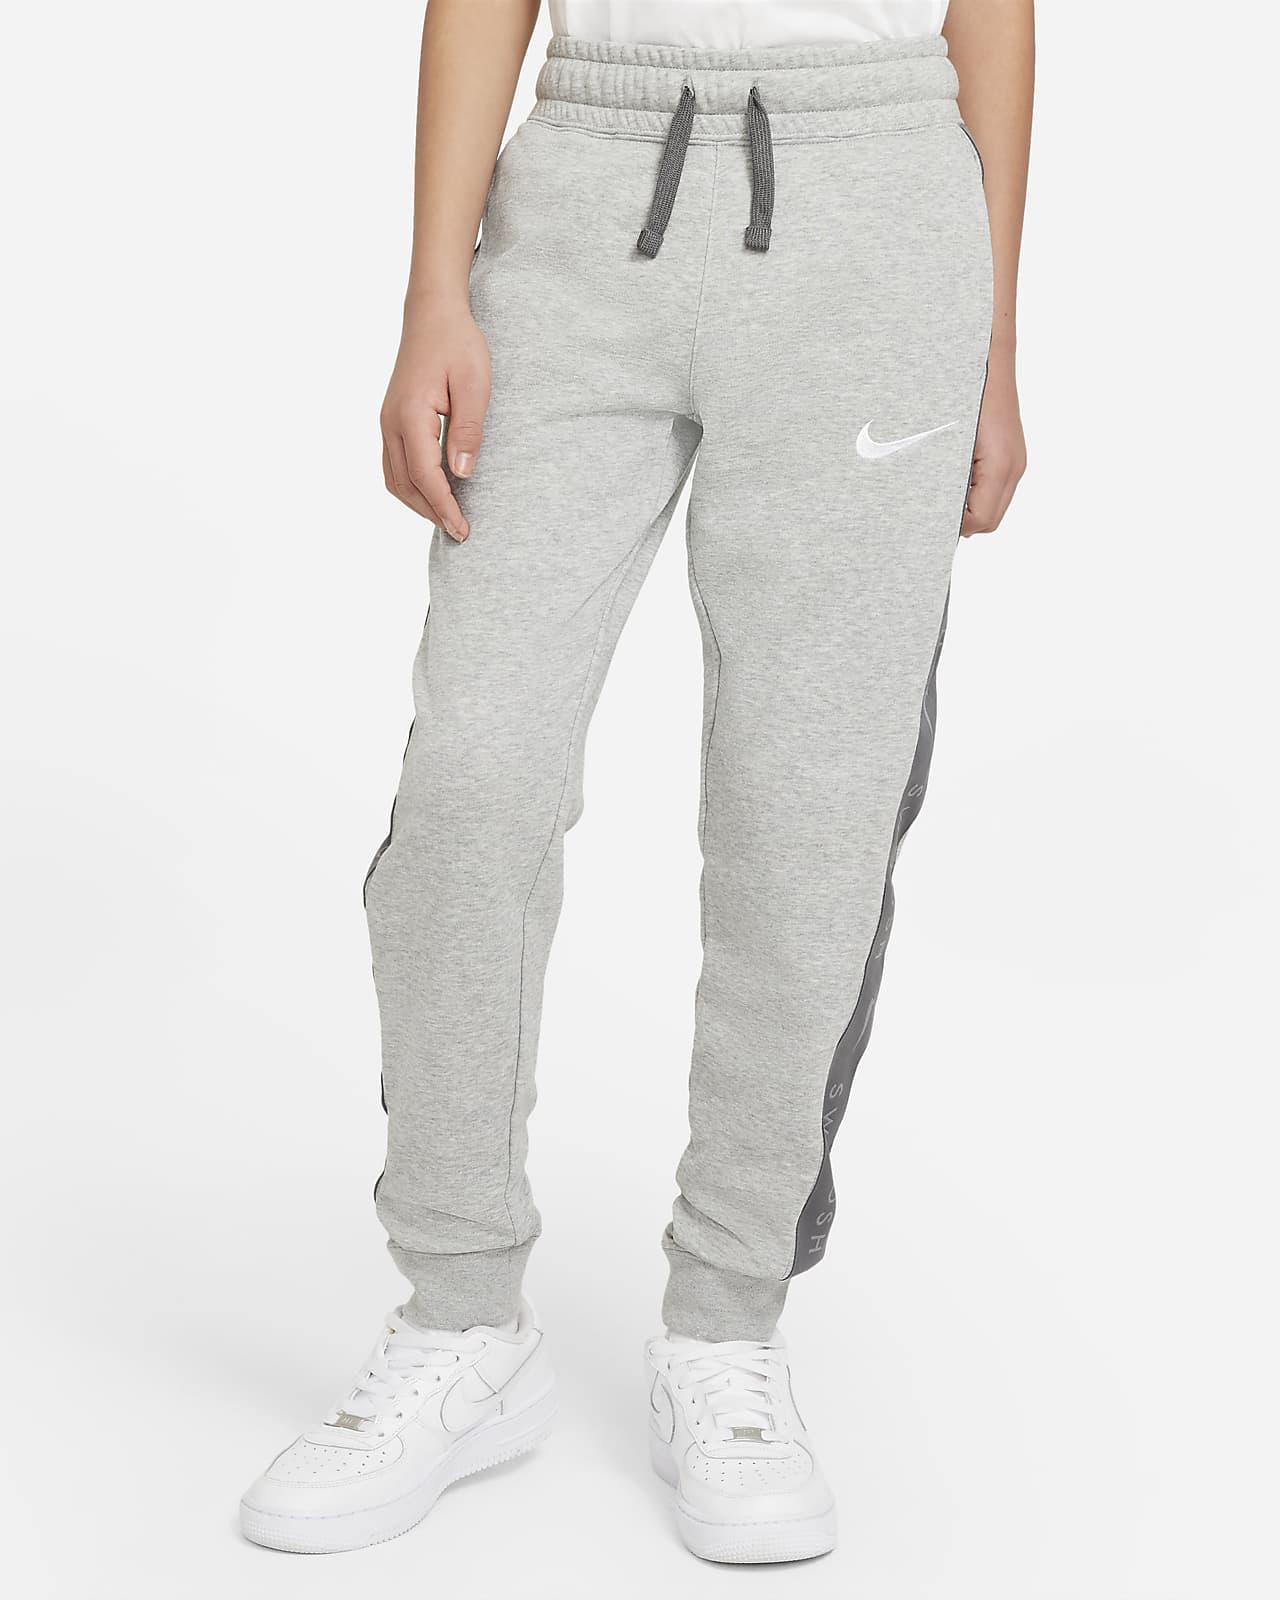 Pantalon en tissu Fleece Nike Sportswear Swoosh pour Garçon plus âgé